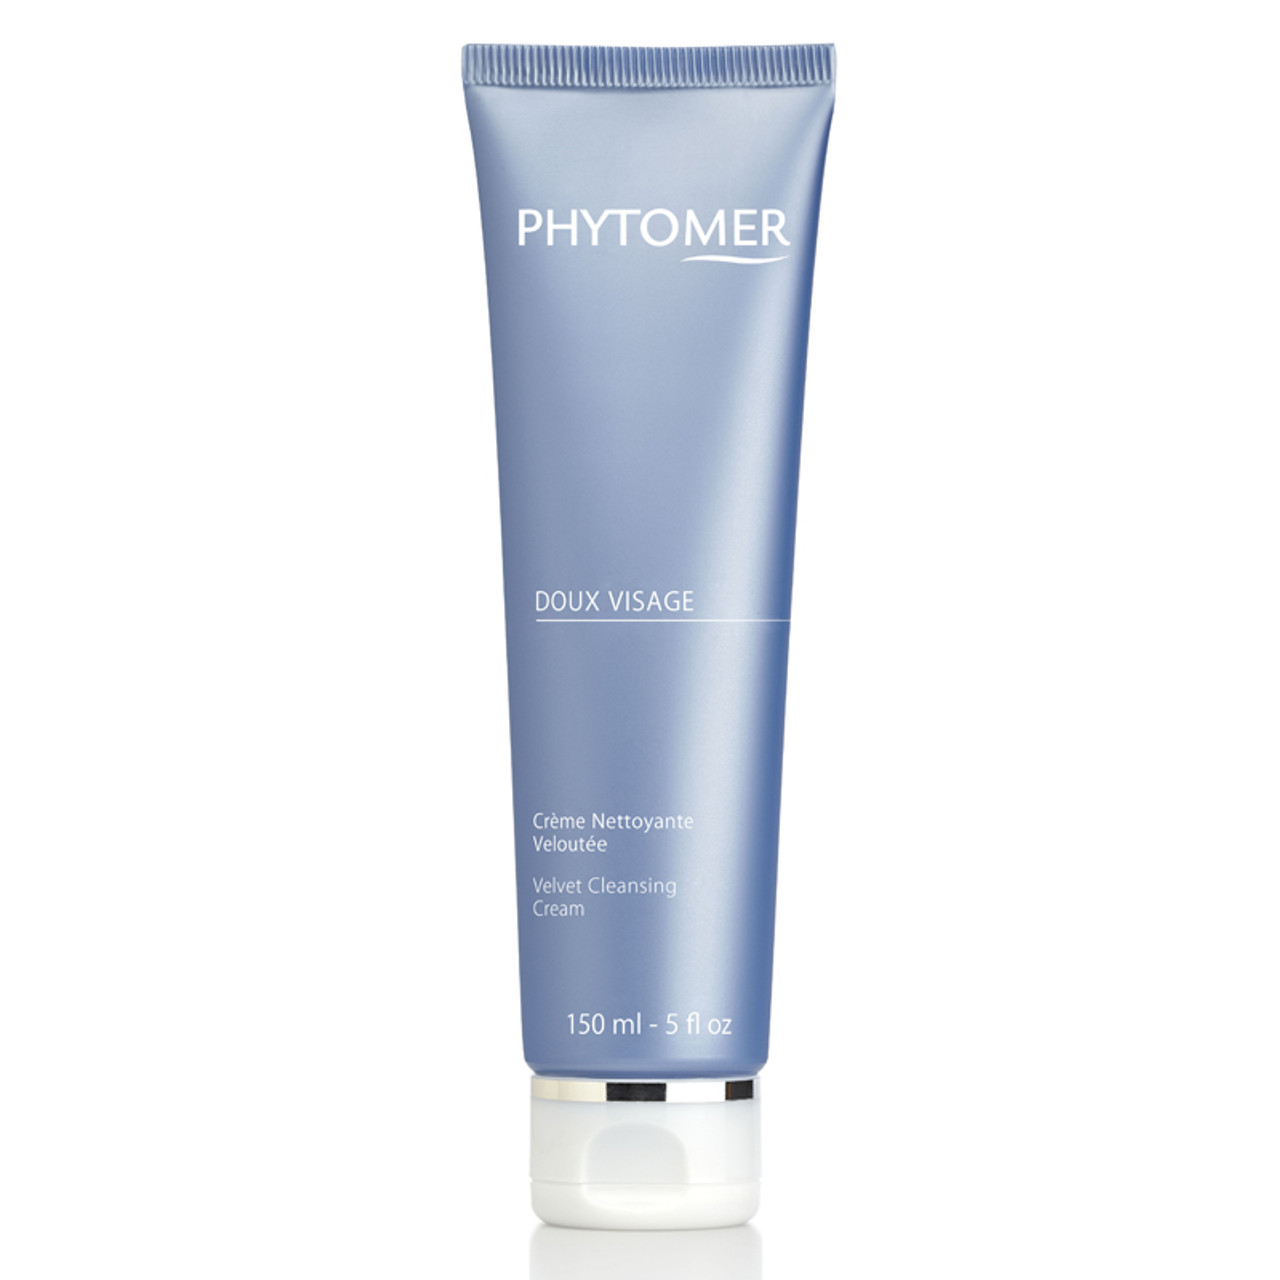 Phytomer Doux Visage Velvet Cleansing Cream